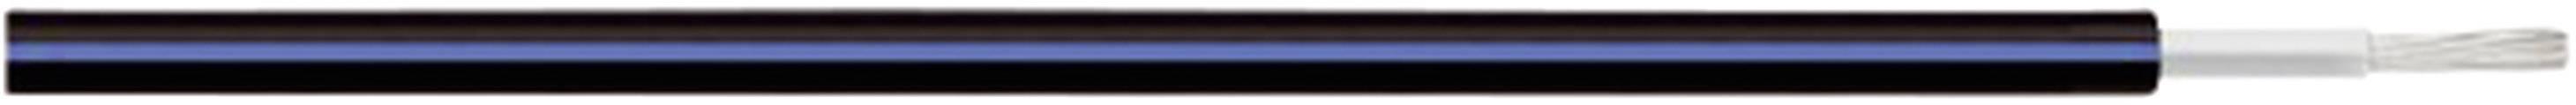 Fotovoltaický kabel ÖLFLEX® SOLAR XLR-R 1 x 4 mm² černá, červená LappKabel 0023391 500 m